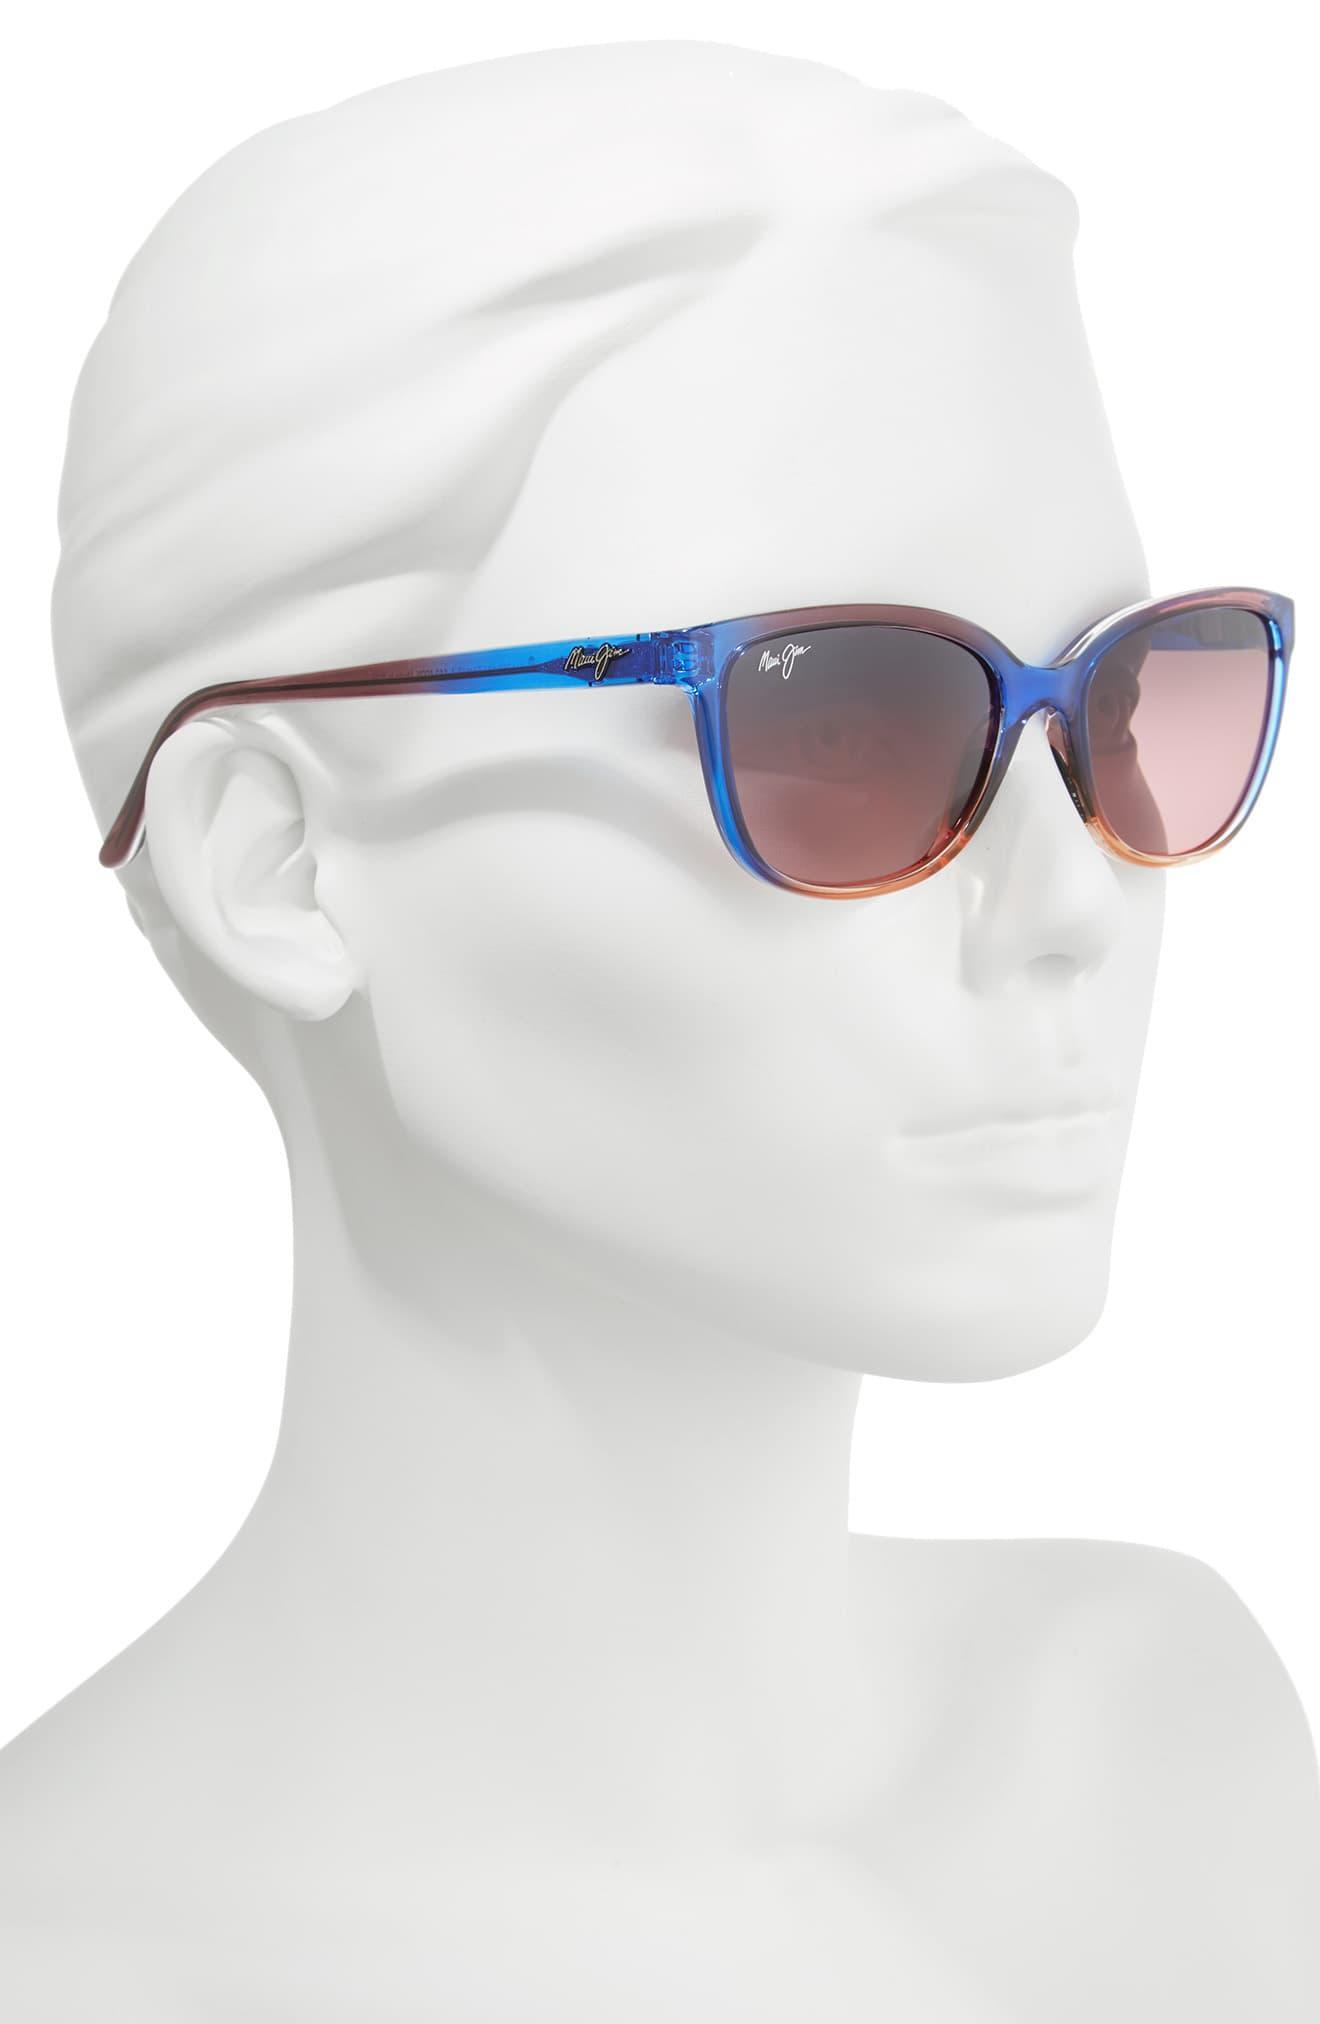 834e0b5390dc Maui Jim Honi Polarized Sunglasses in Blue - Save 8% - Lyst